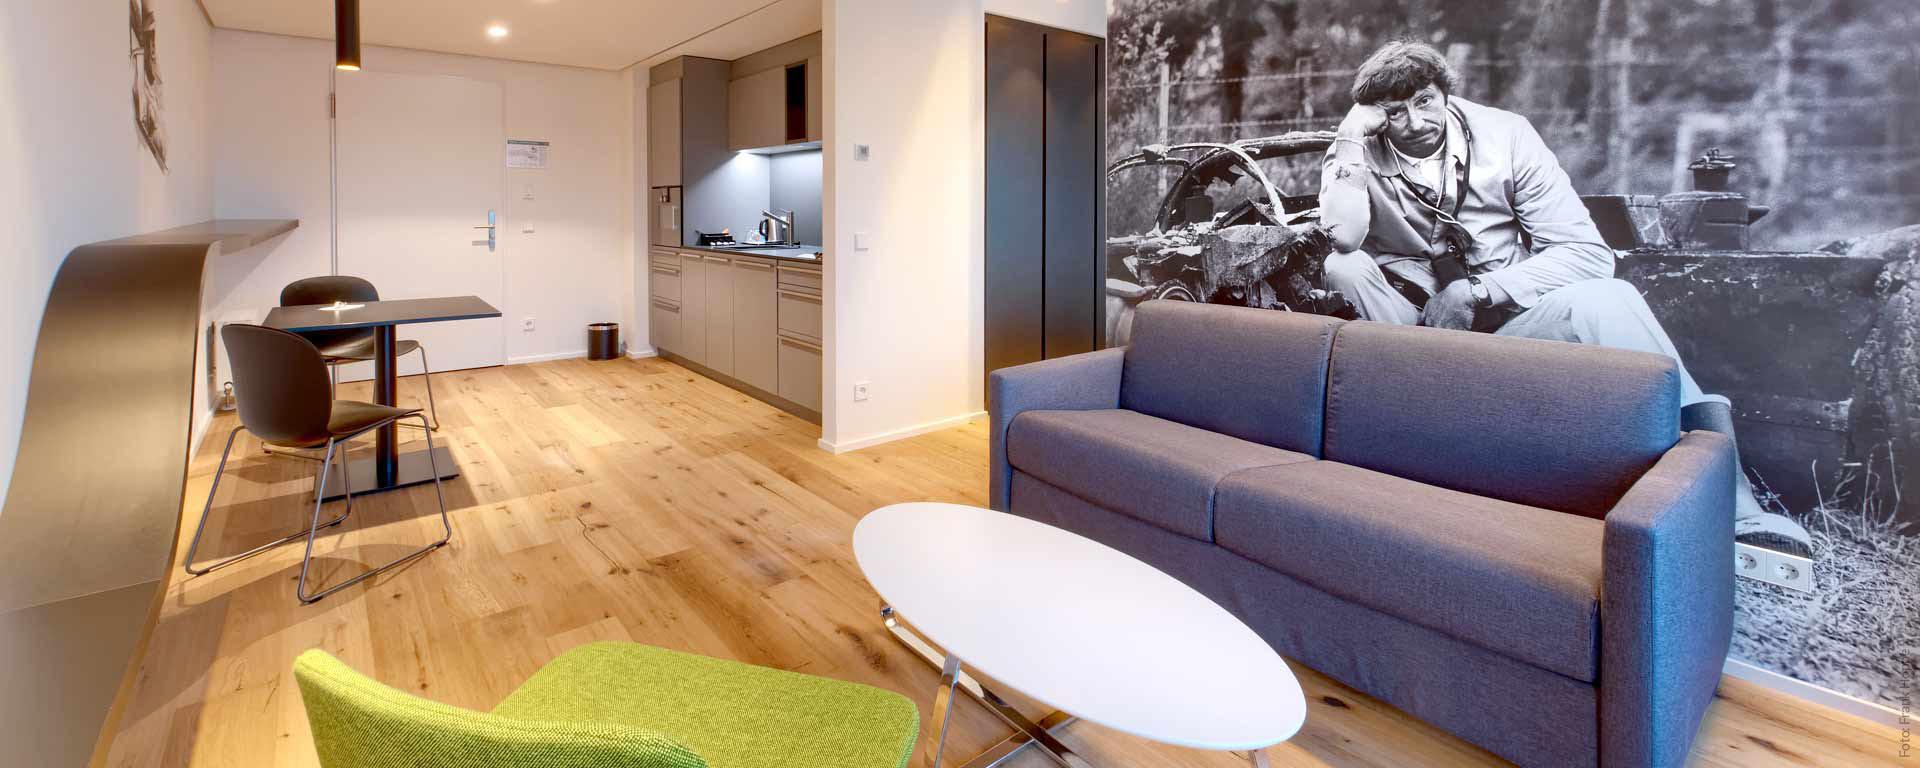 4 Sterne V8 Hotel Longstay Apartment/ Boardinghouse für Langzeitnutzer in Böblingen/ Familien-Zimmer & Unterkunft